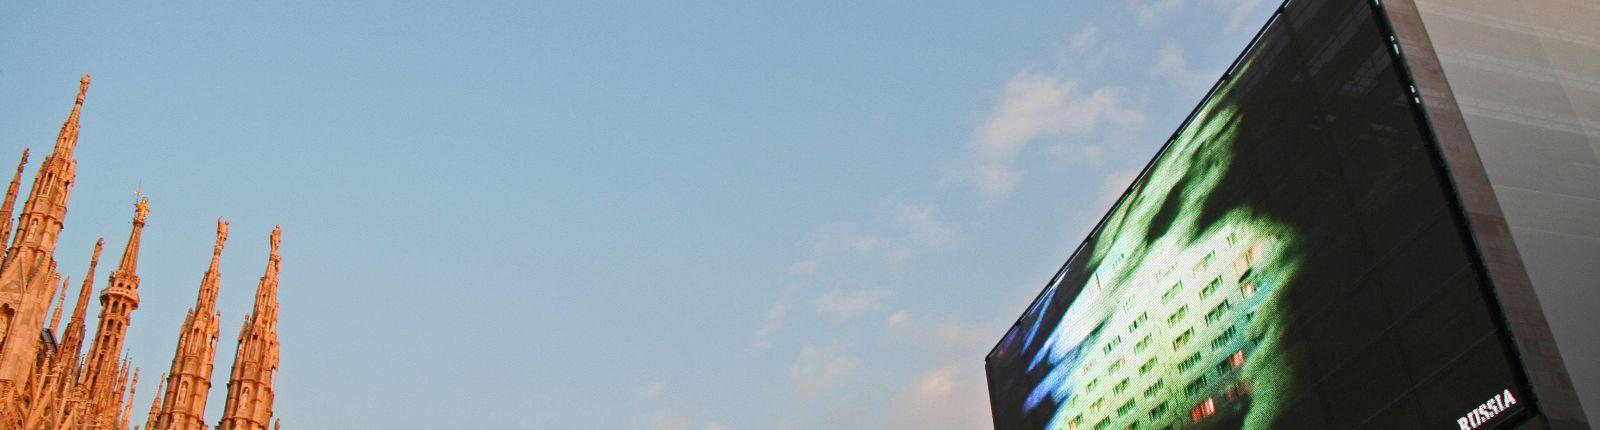 "Transparent media façade clads scaffolding at the ""Piazza del Duomo"" in Milan"